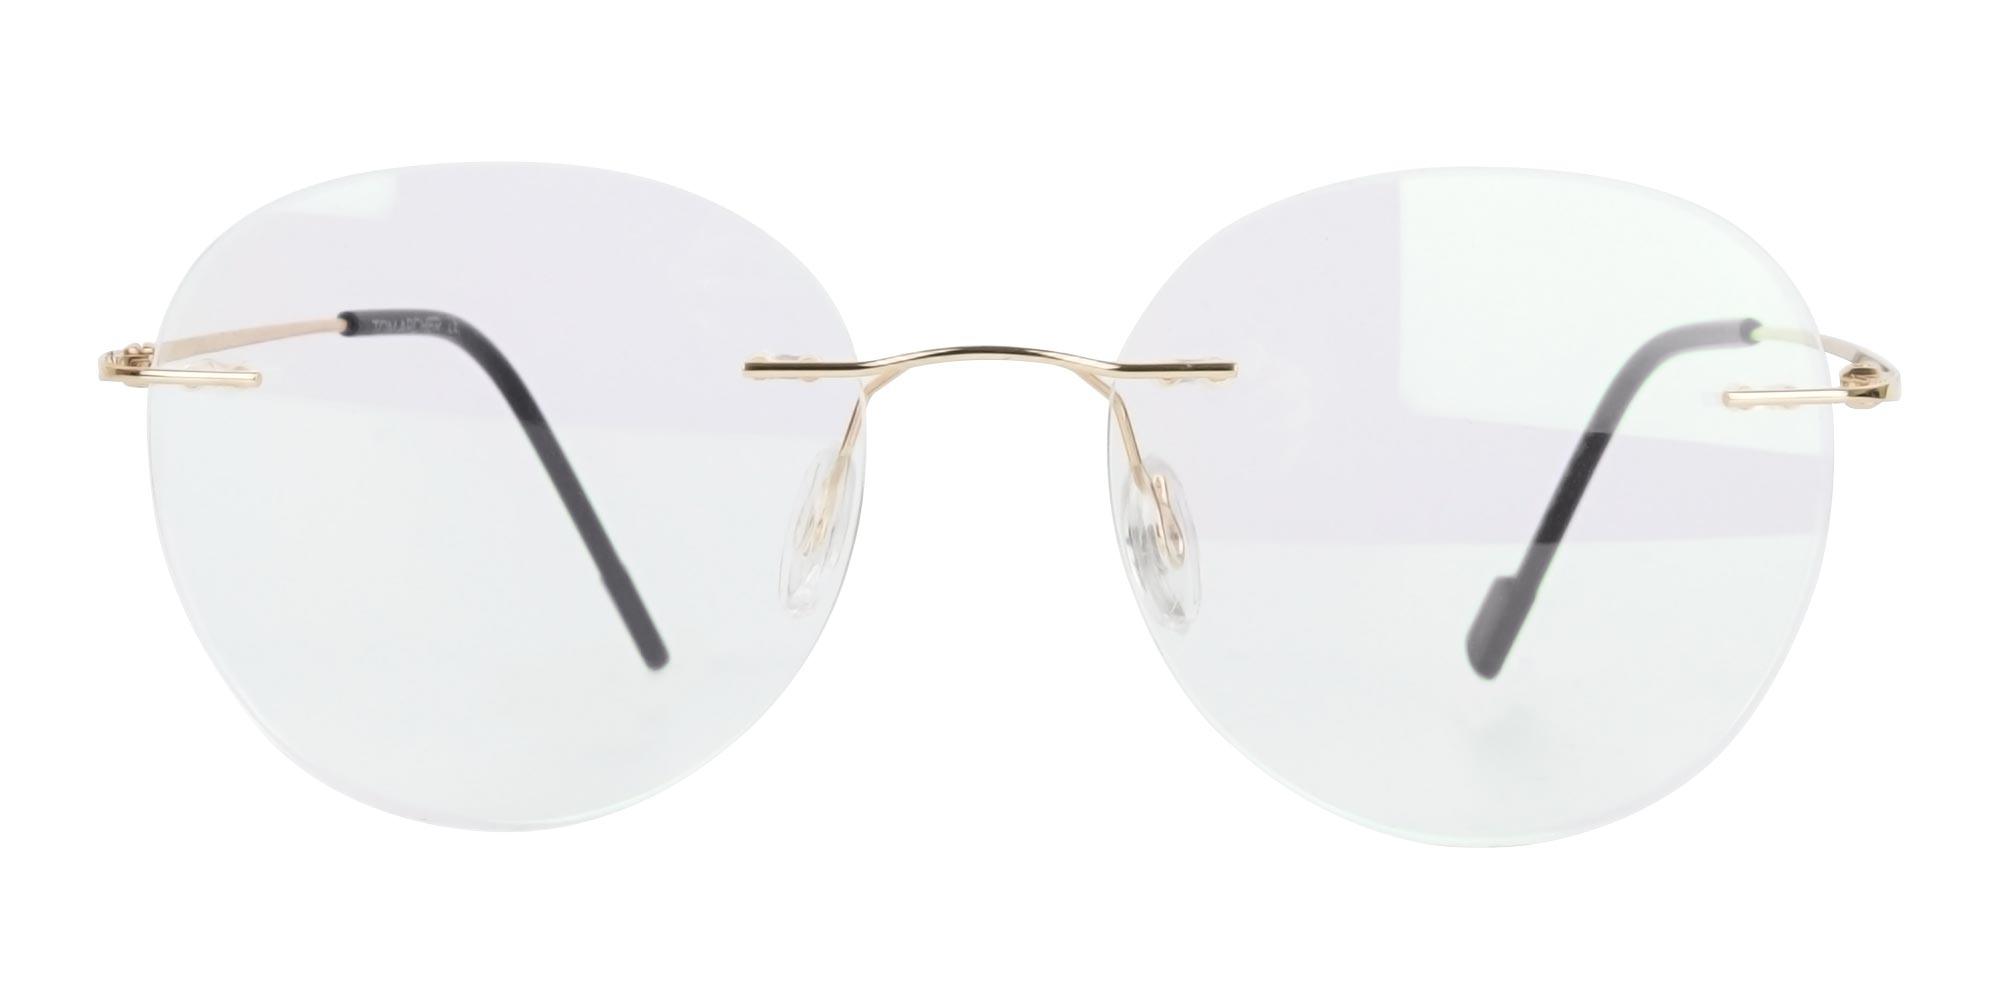 glasses for square face shape round frame